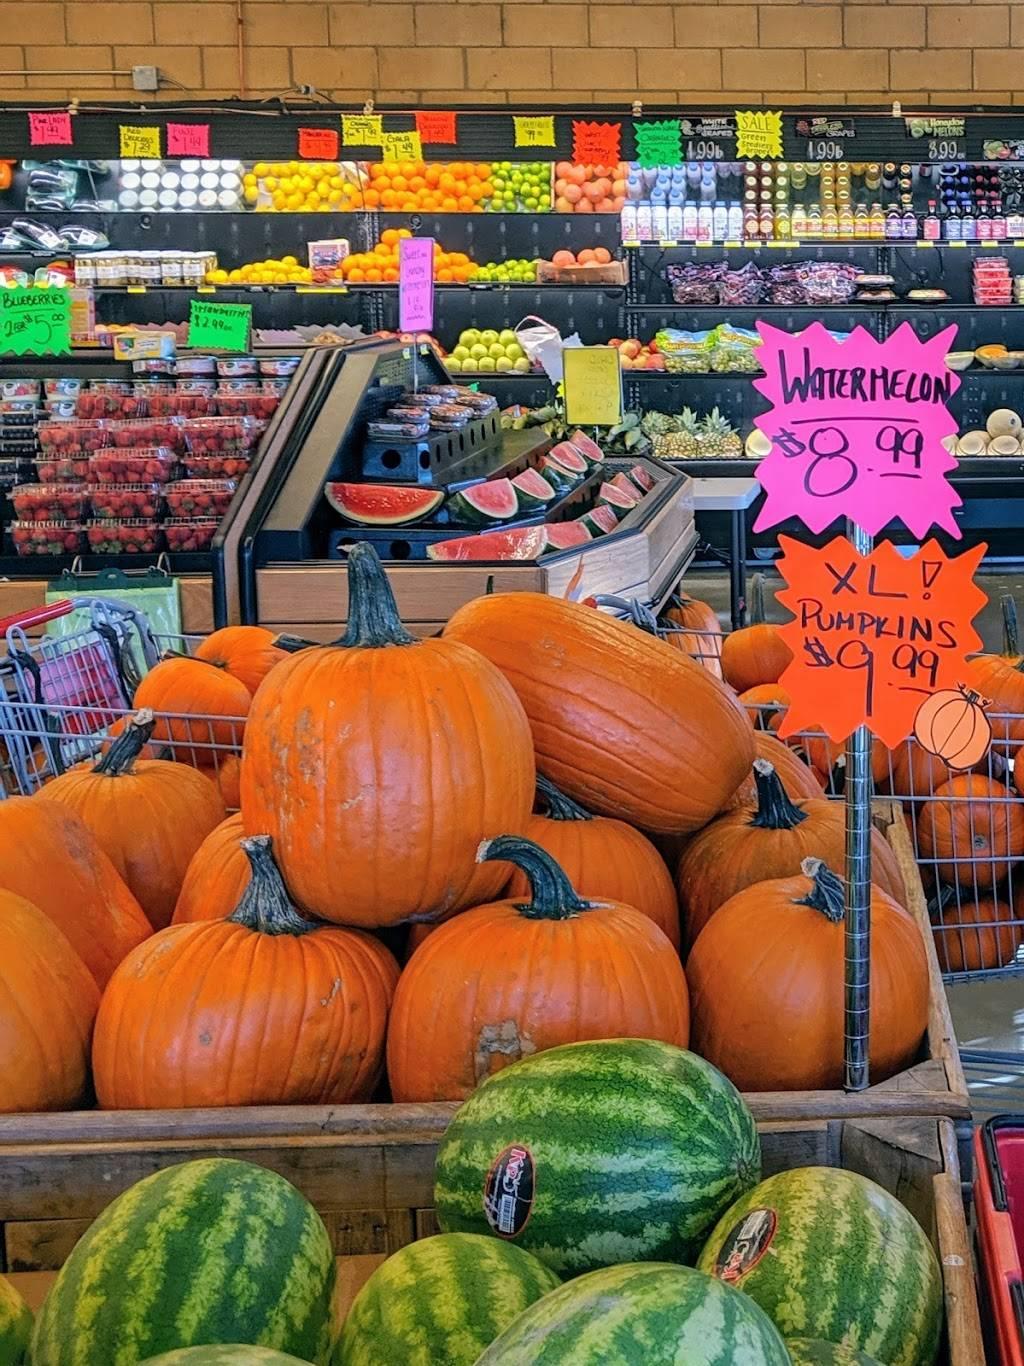 Romanos Farmers Market & Deli - store  | Photo 1 of 3 | Address: 8875 Ridge Rd, North Royalton, OH 44133, USA | Phone: (440) 237-7888